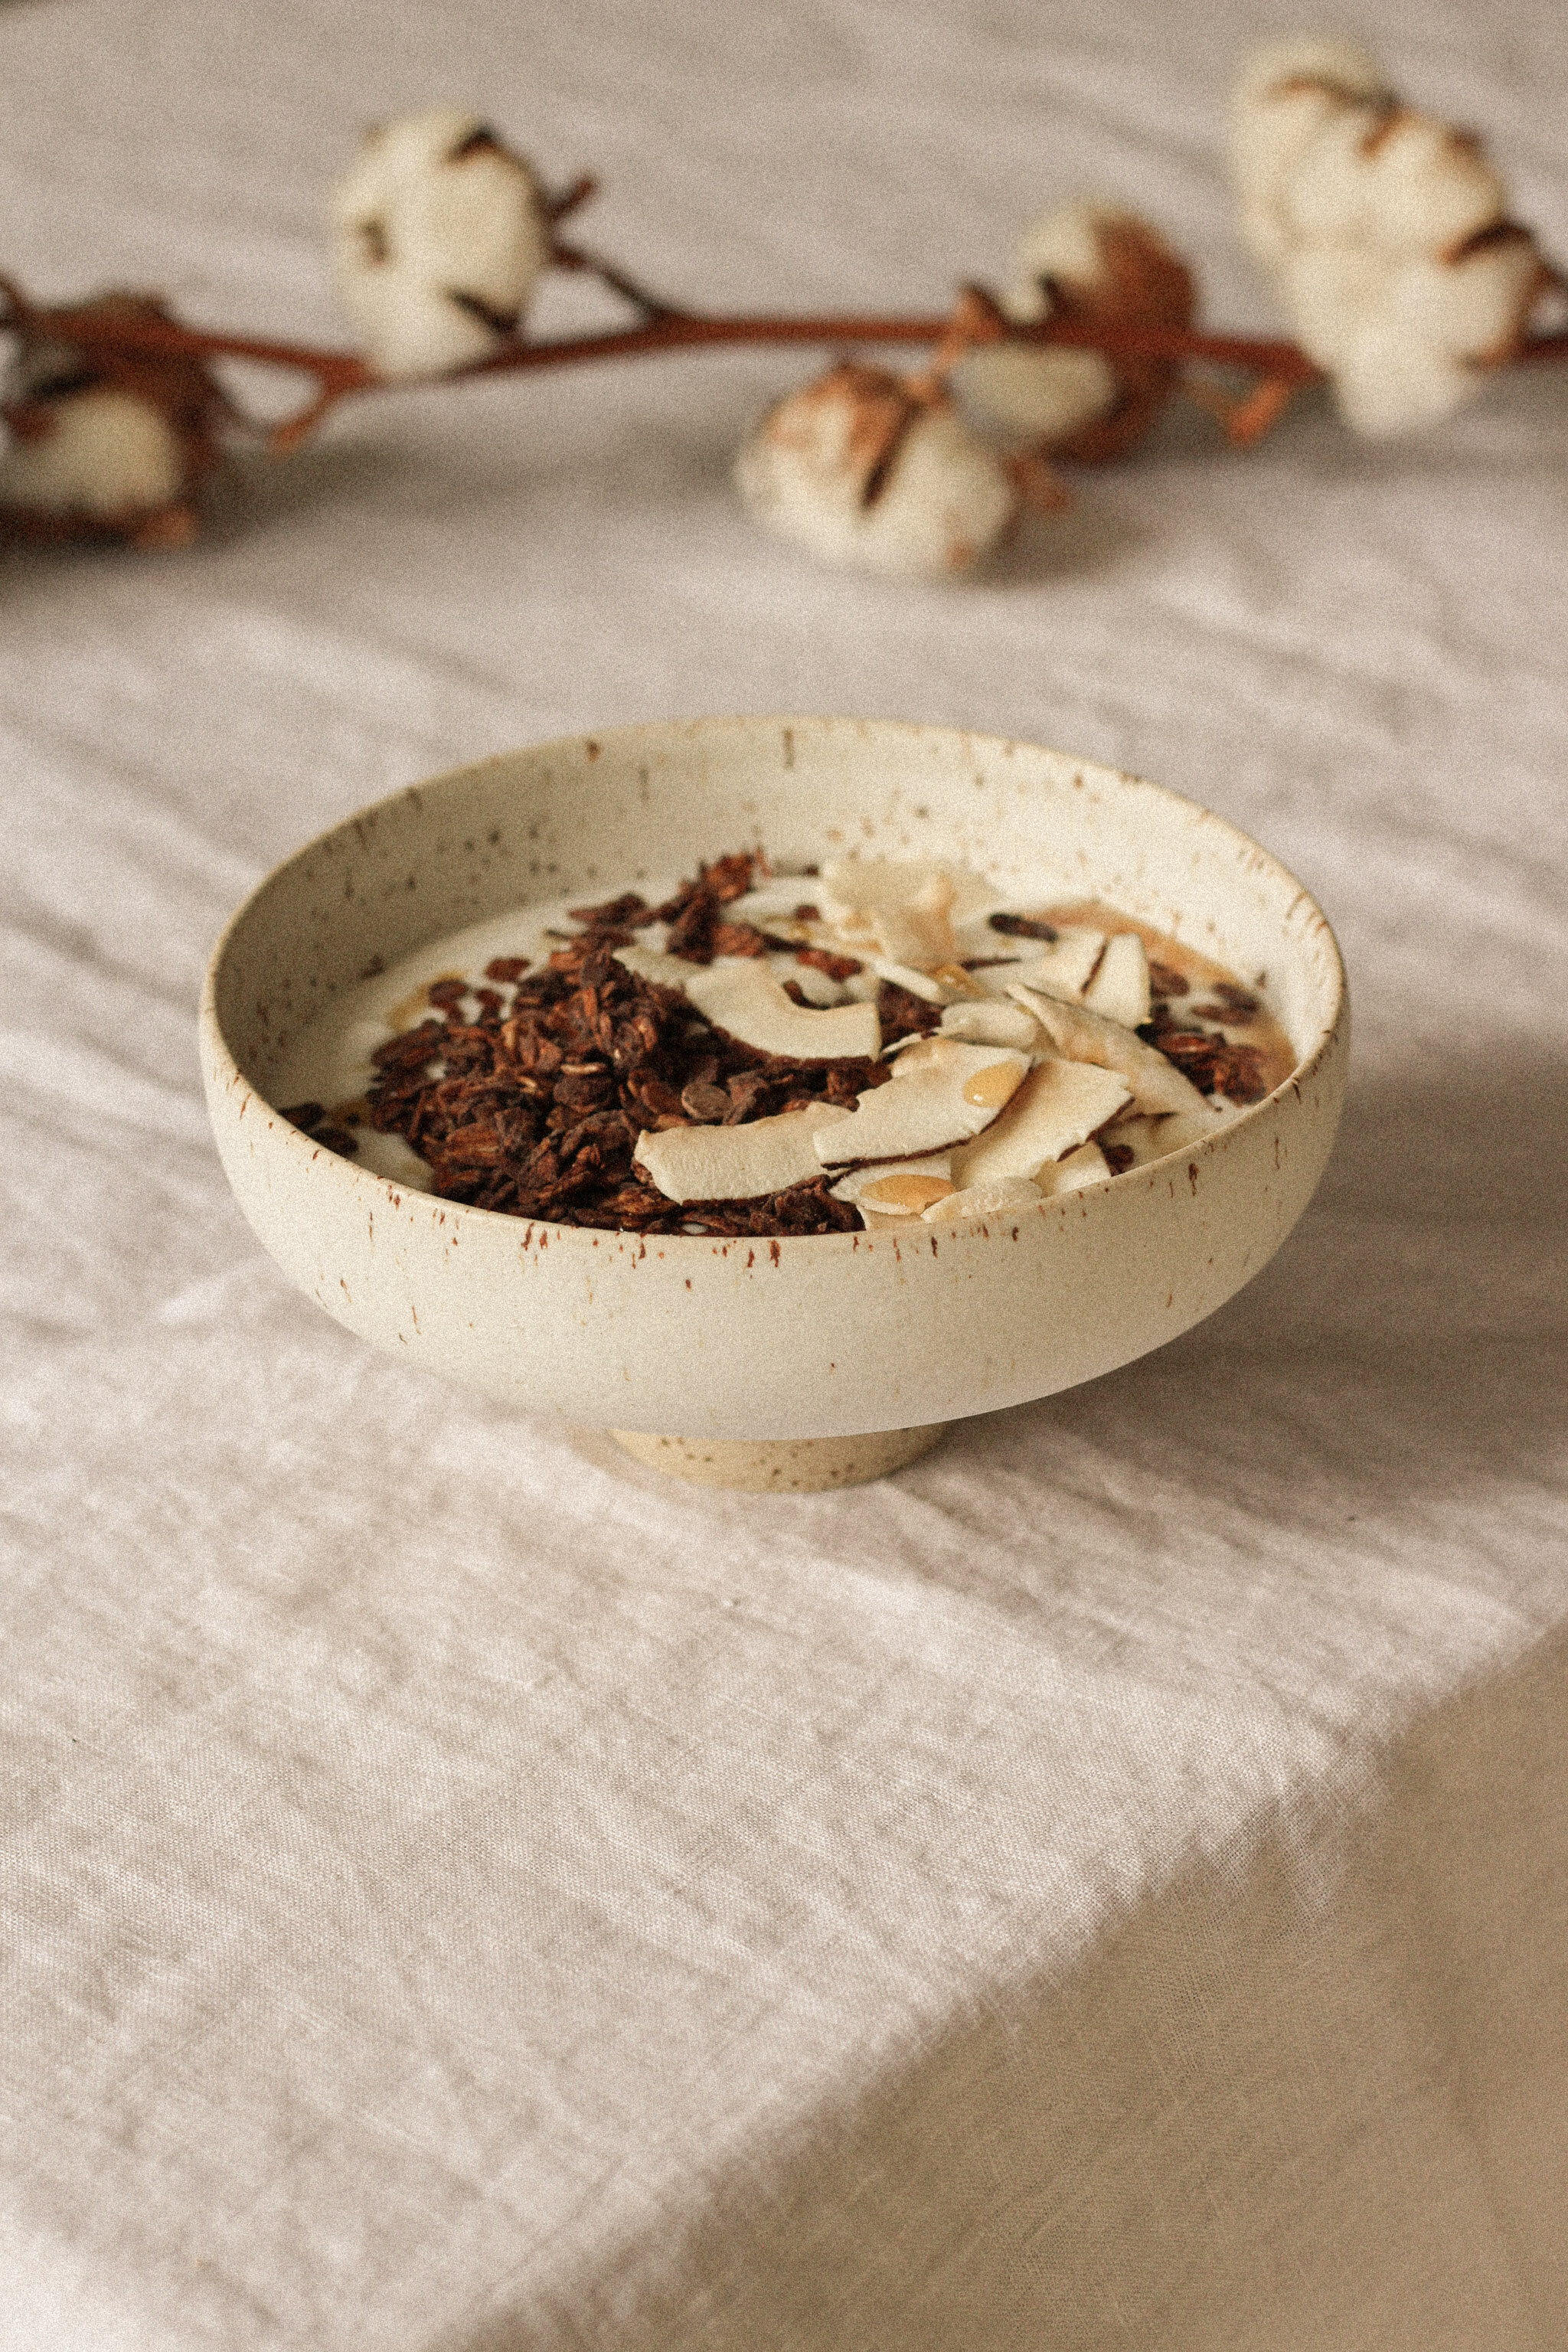 louiseskadhauge-sarahhillaireau-maisonlouno-maisonlouno-Granola coco 2.jpg